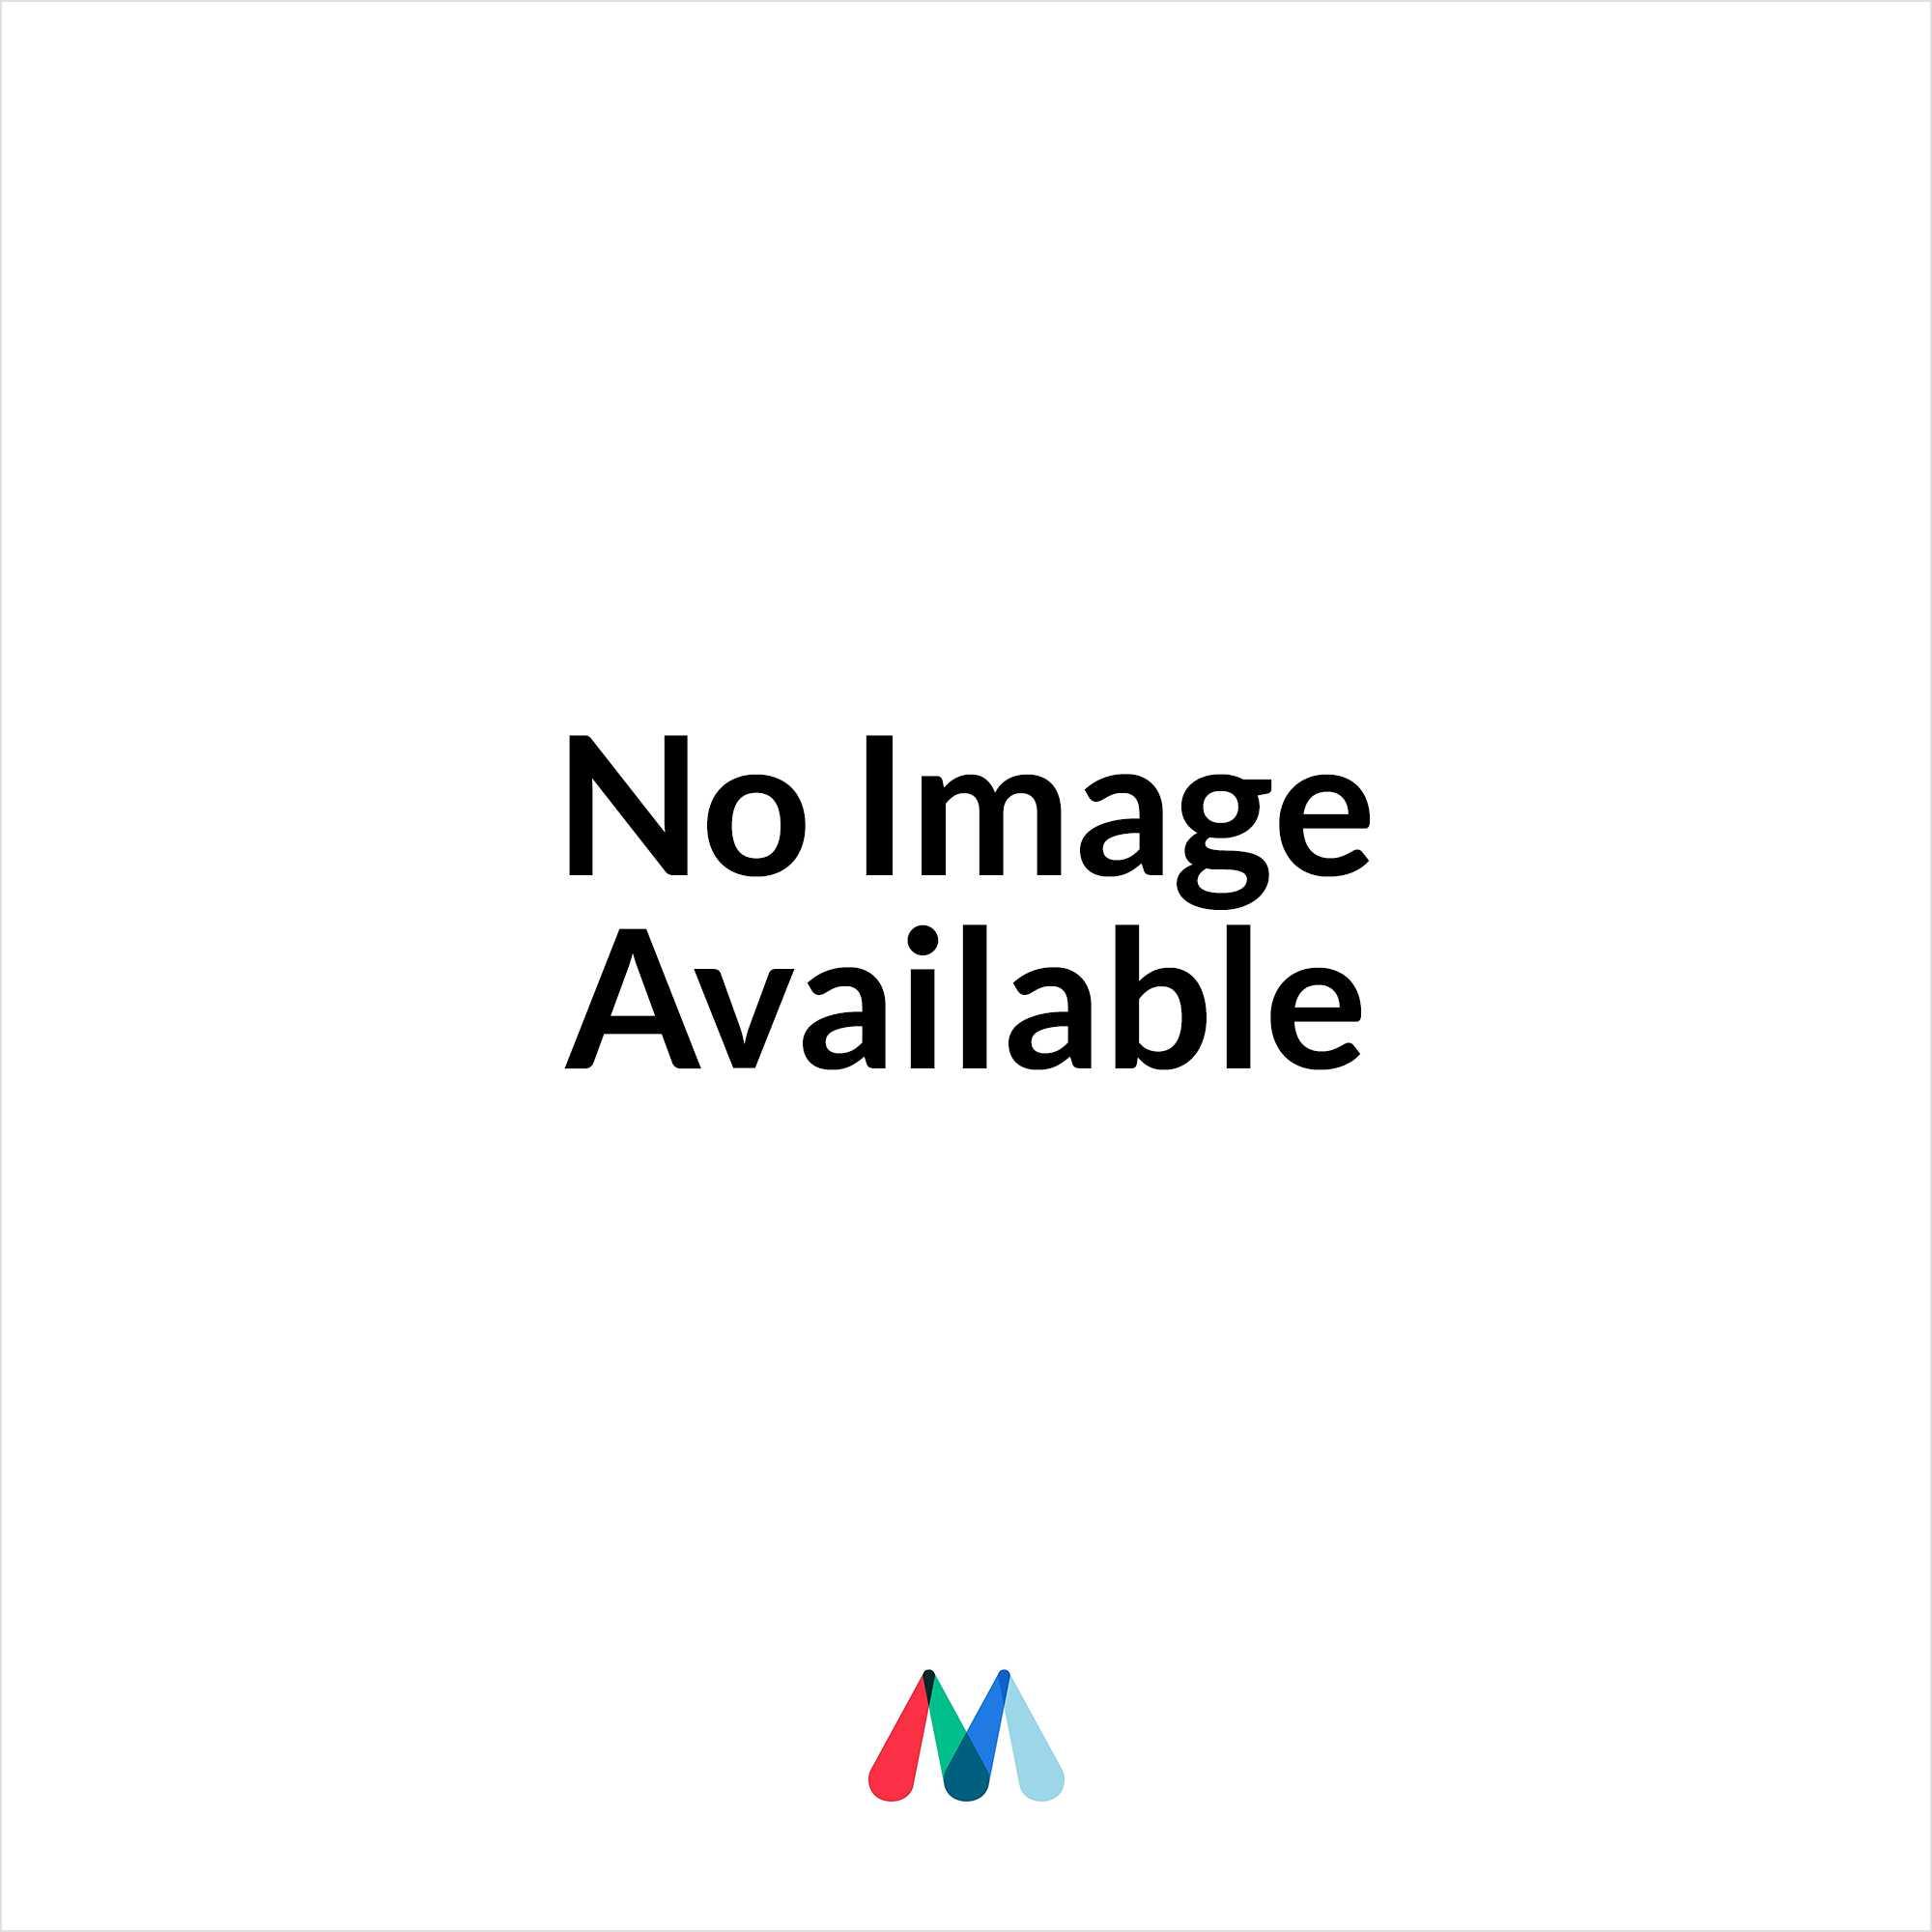 Collingwood Lighting MC010 S mini cube LED wall light - Aluminium - Low voltage